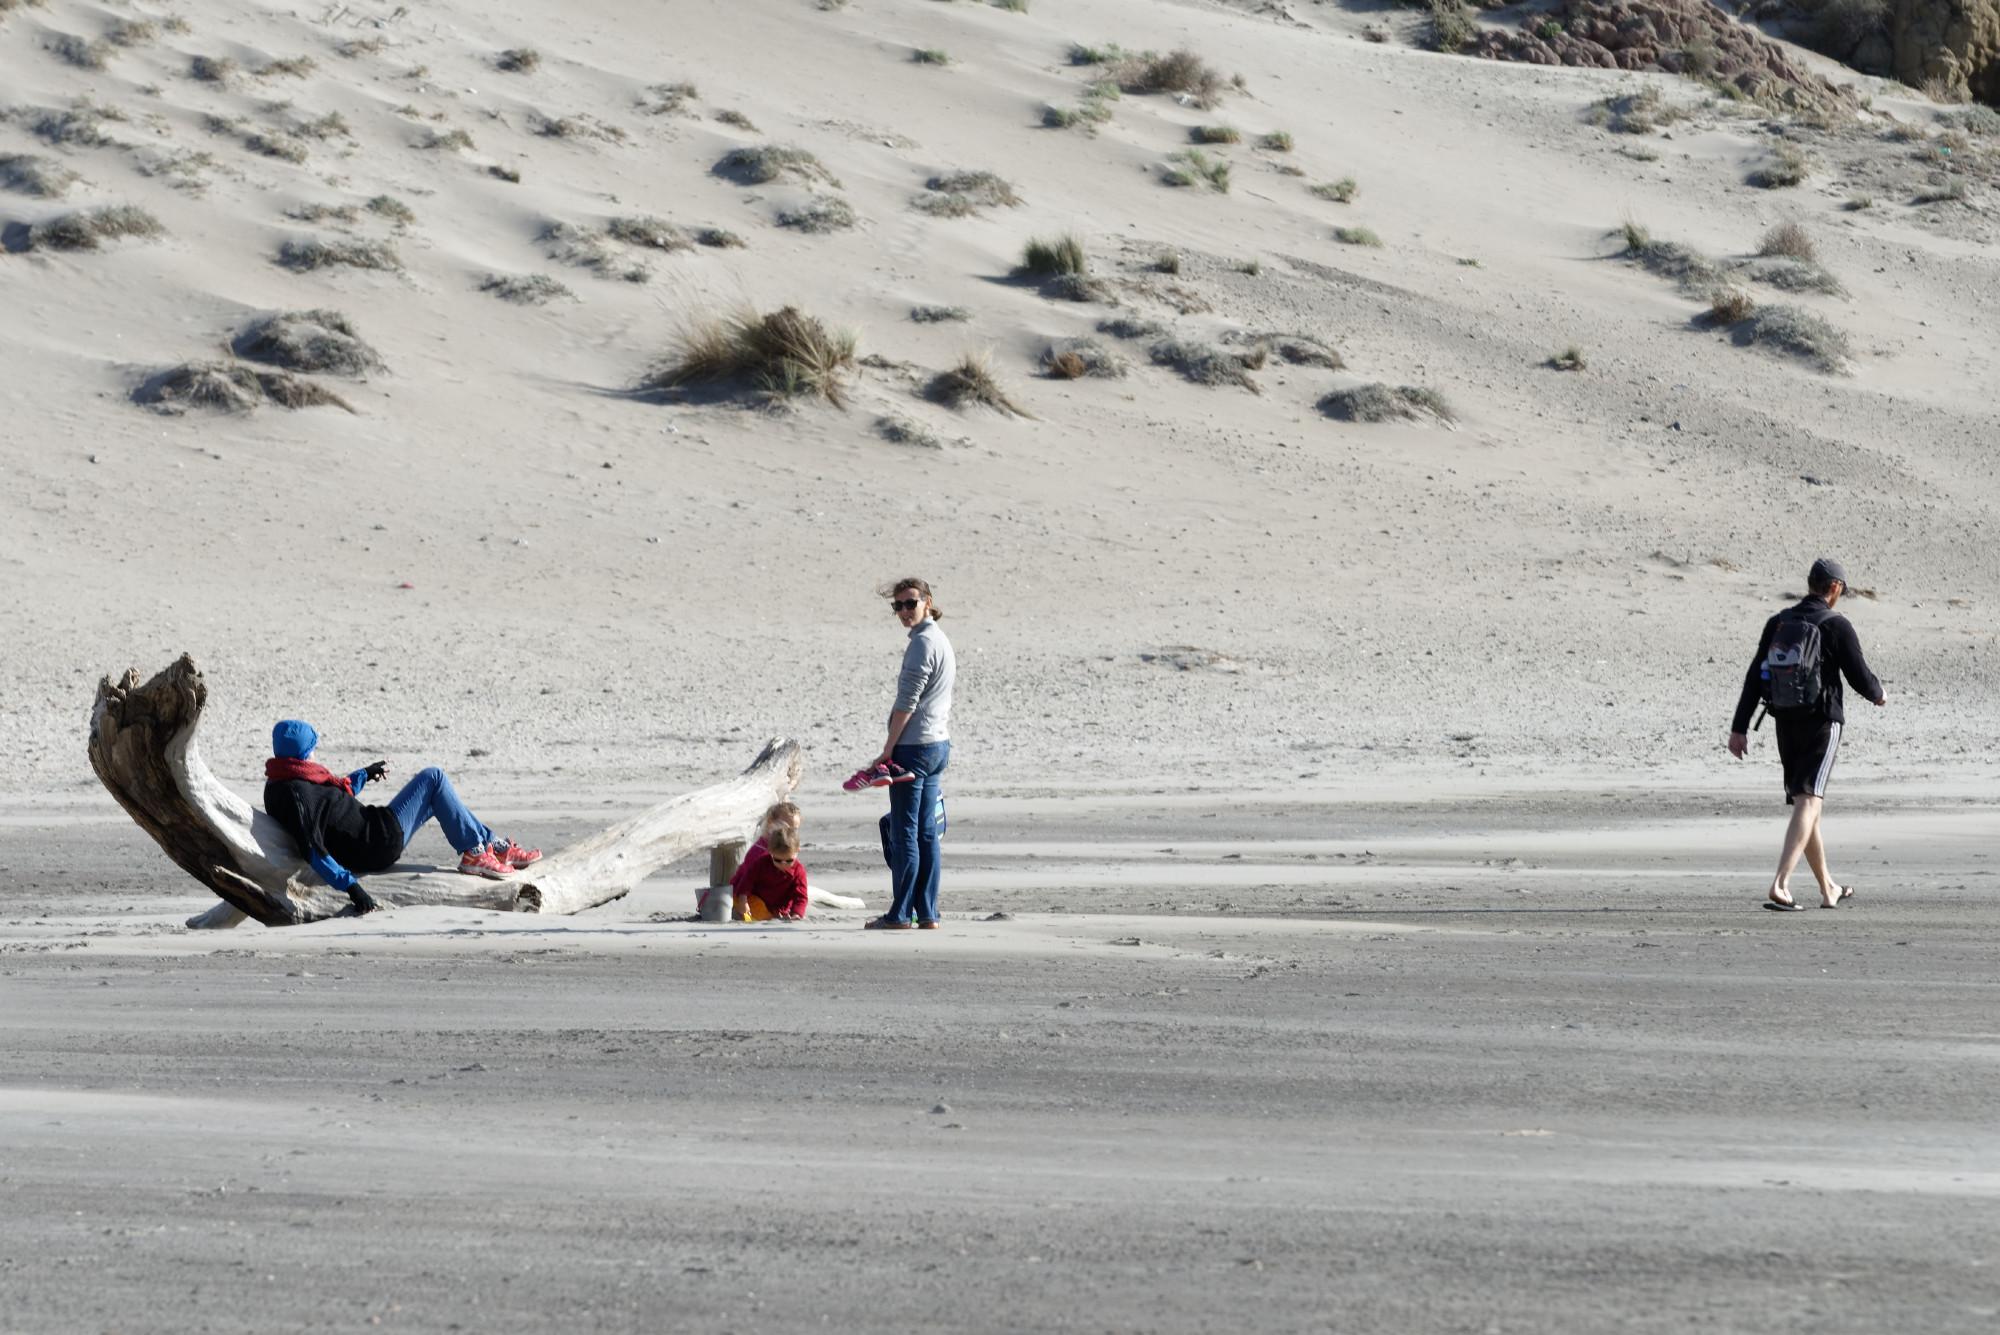 171214-San Jose-Playa del Monsul (Cabo de Gata-Andalousie) (148)